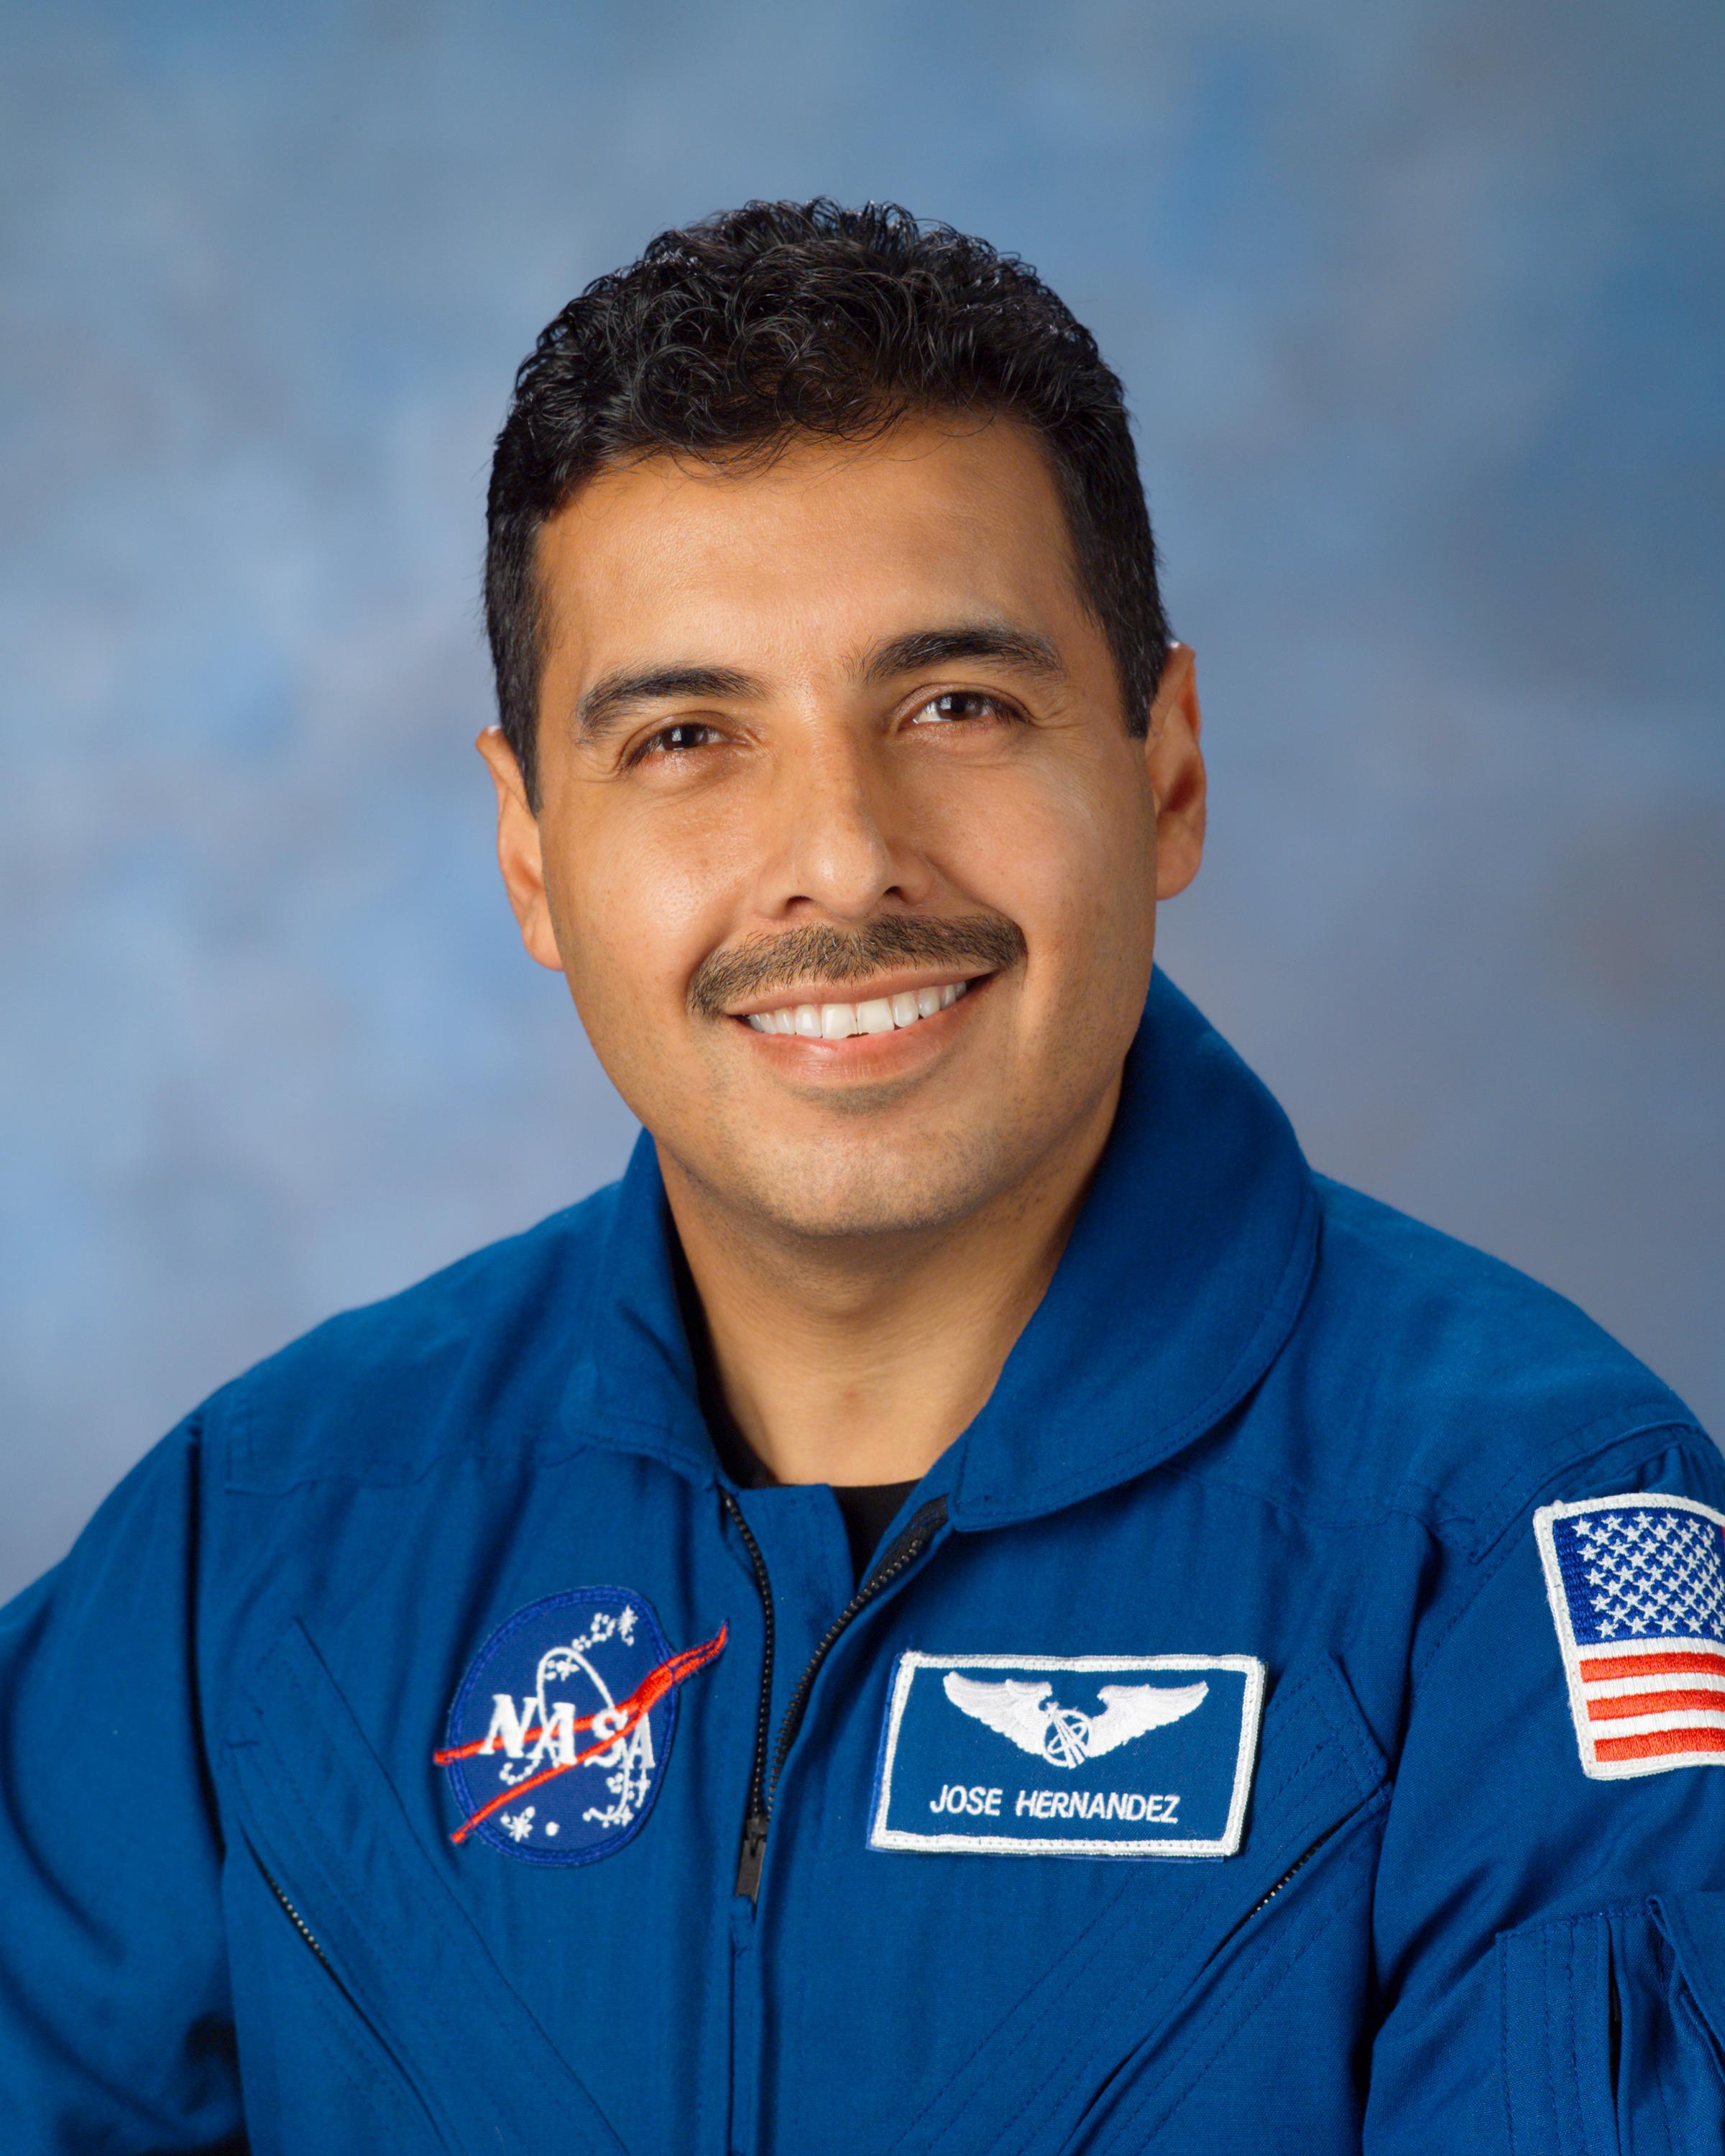 Jose Hernandez Astronaut Biography